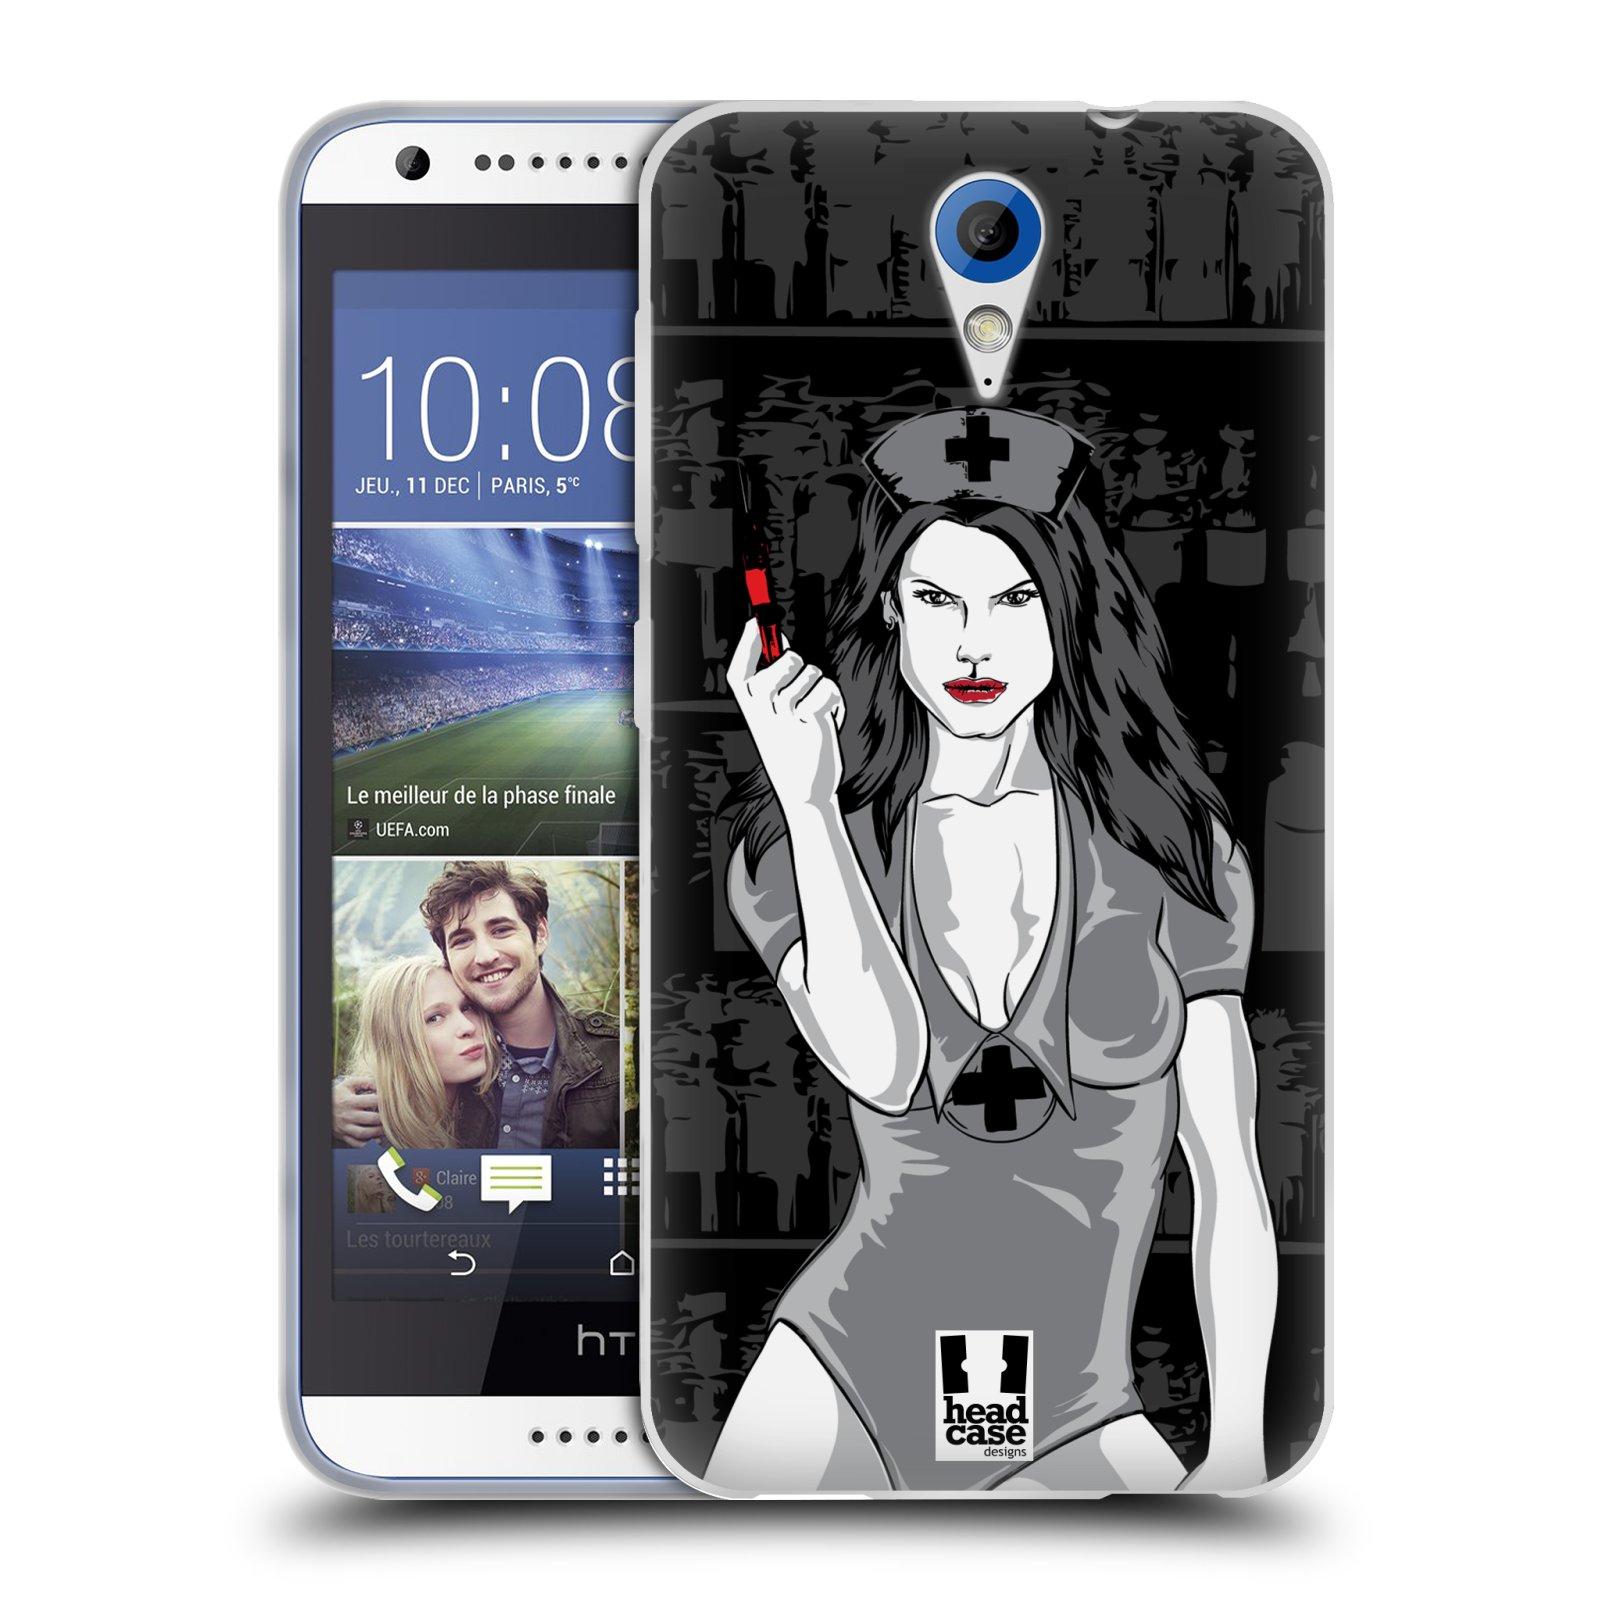 Silikonové pouzdro na mobil HTC Desire 620 HEAD CASE TESSA (Silikonový kryt či obal na mobilní telefon HTC Desire 620)